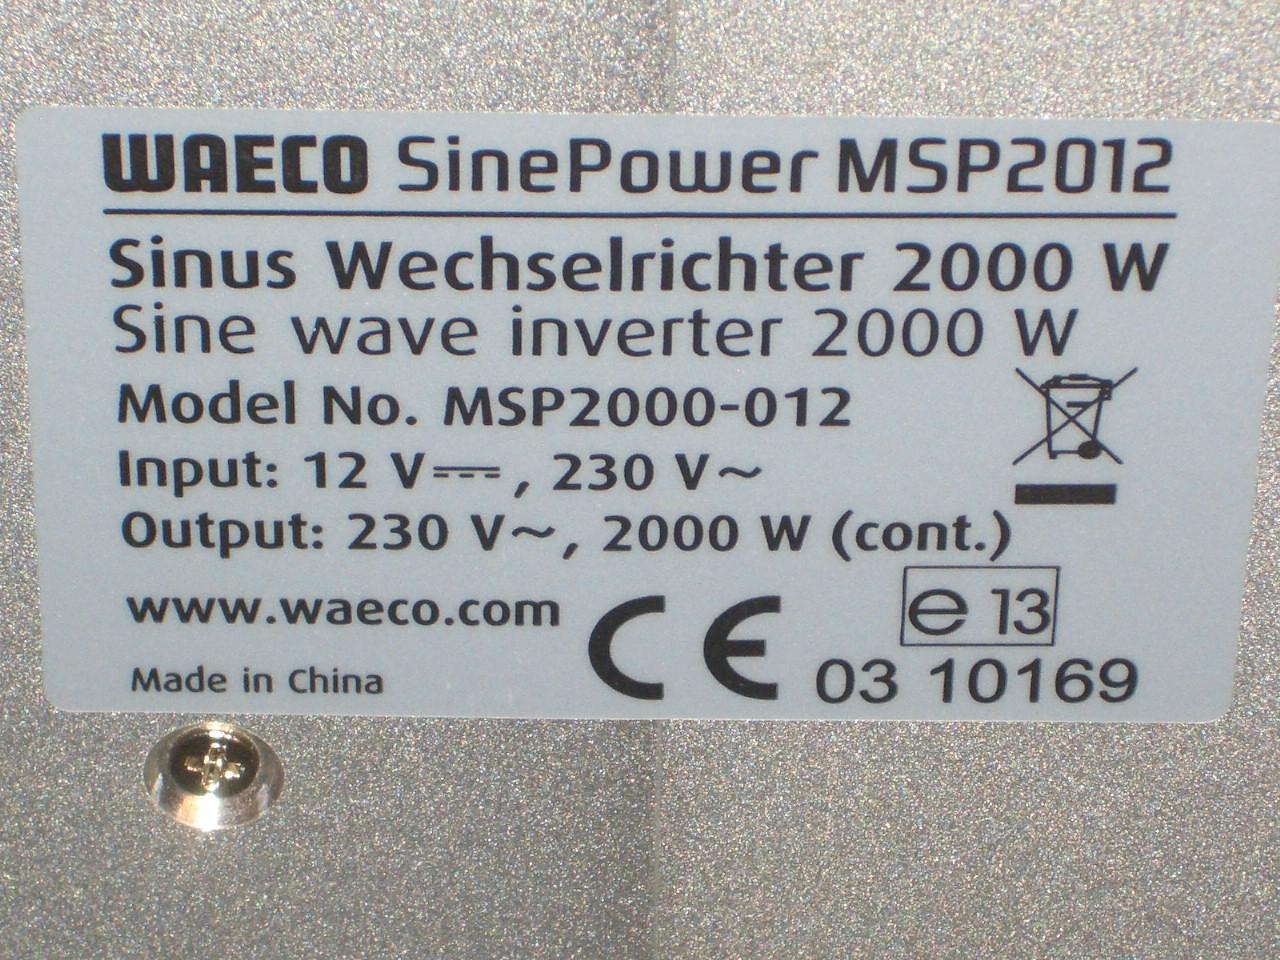 camping waeco sinus wechselrichter inverter sinepower msp 2012 12v 2000 watt ebay. Black Bedroom Furniture Sets. Home Design Ideas